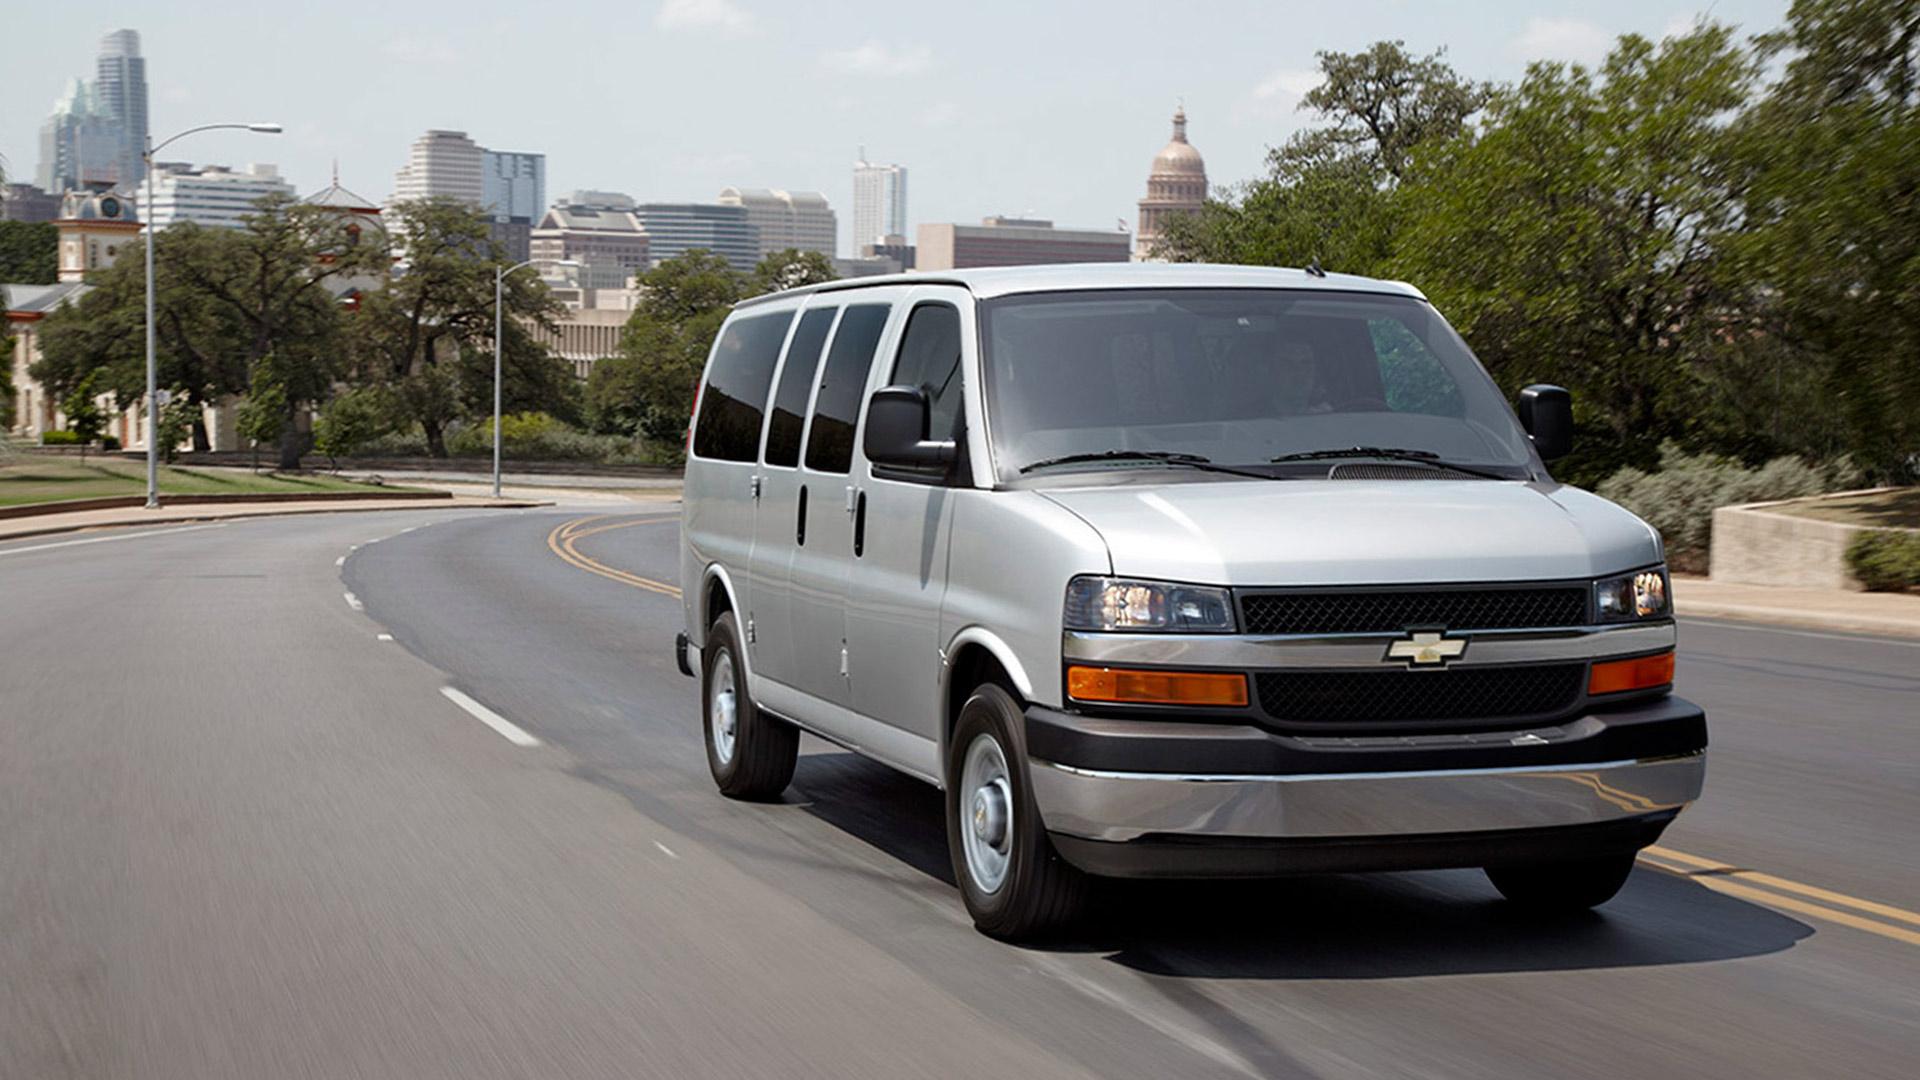 the 2016 express passenger van from chevrolet. Black Bedroom Furniture Sets. Home Design Ideas